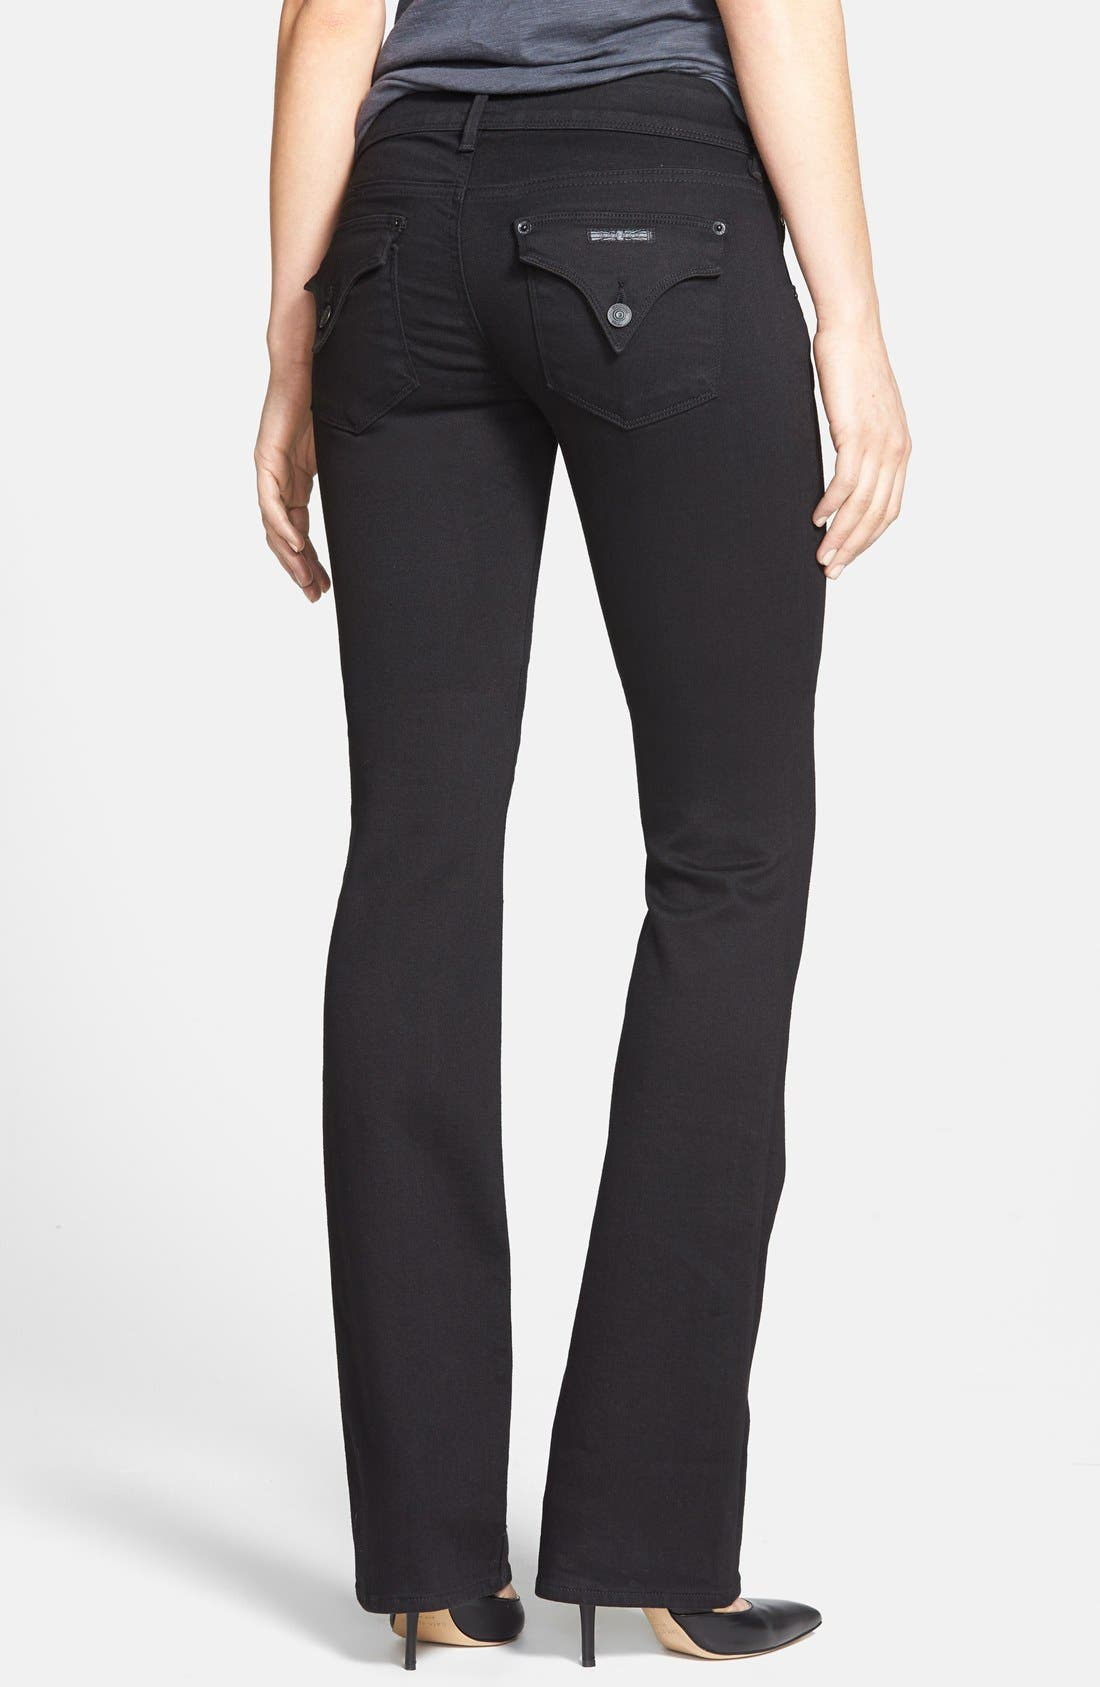 Alternate Image 2  - Hudson Jeans 'Beth' Baby Bootcut Jeans (Black) (Online Only)